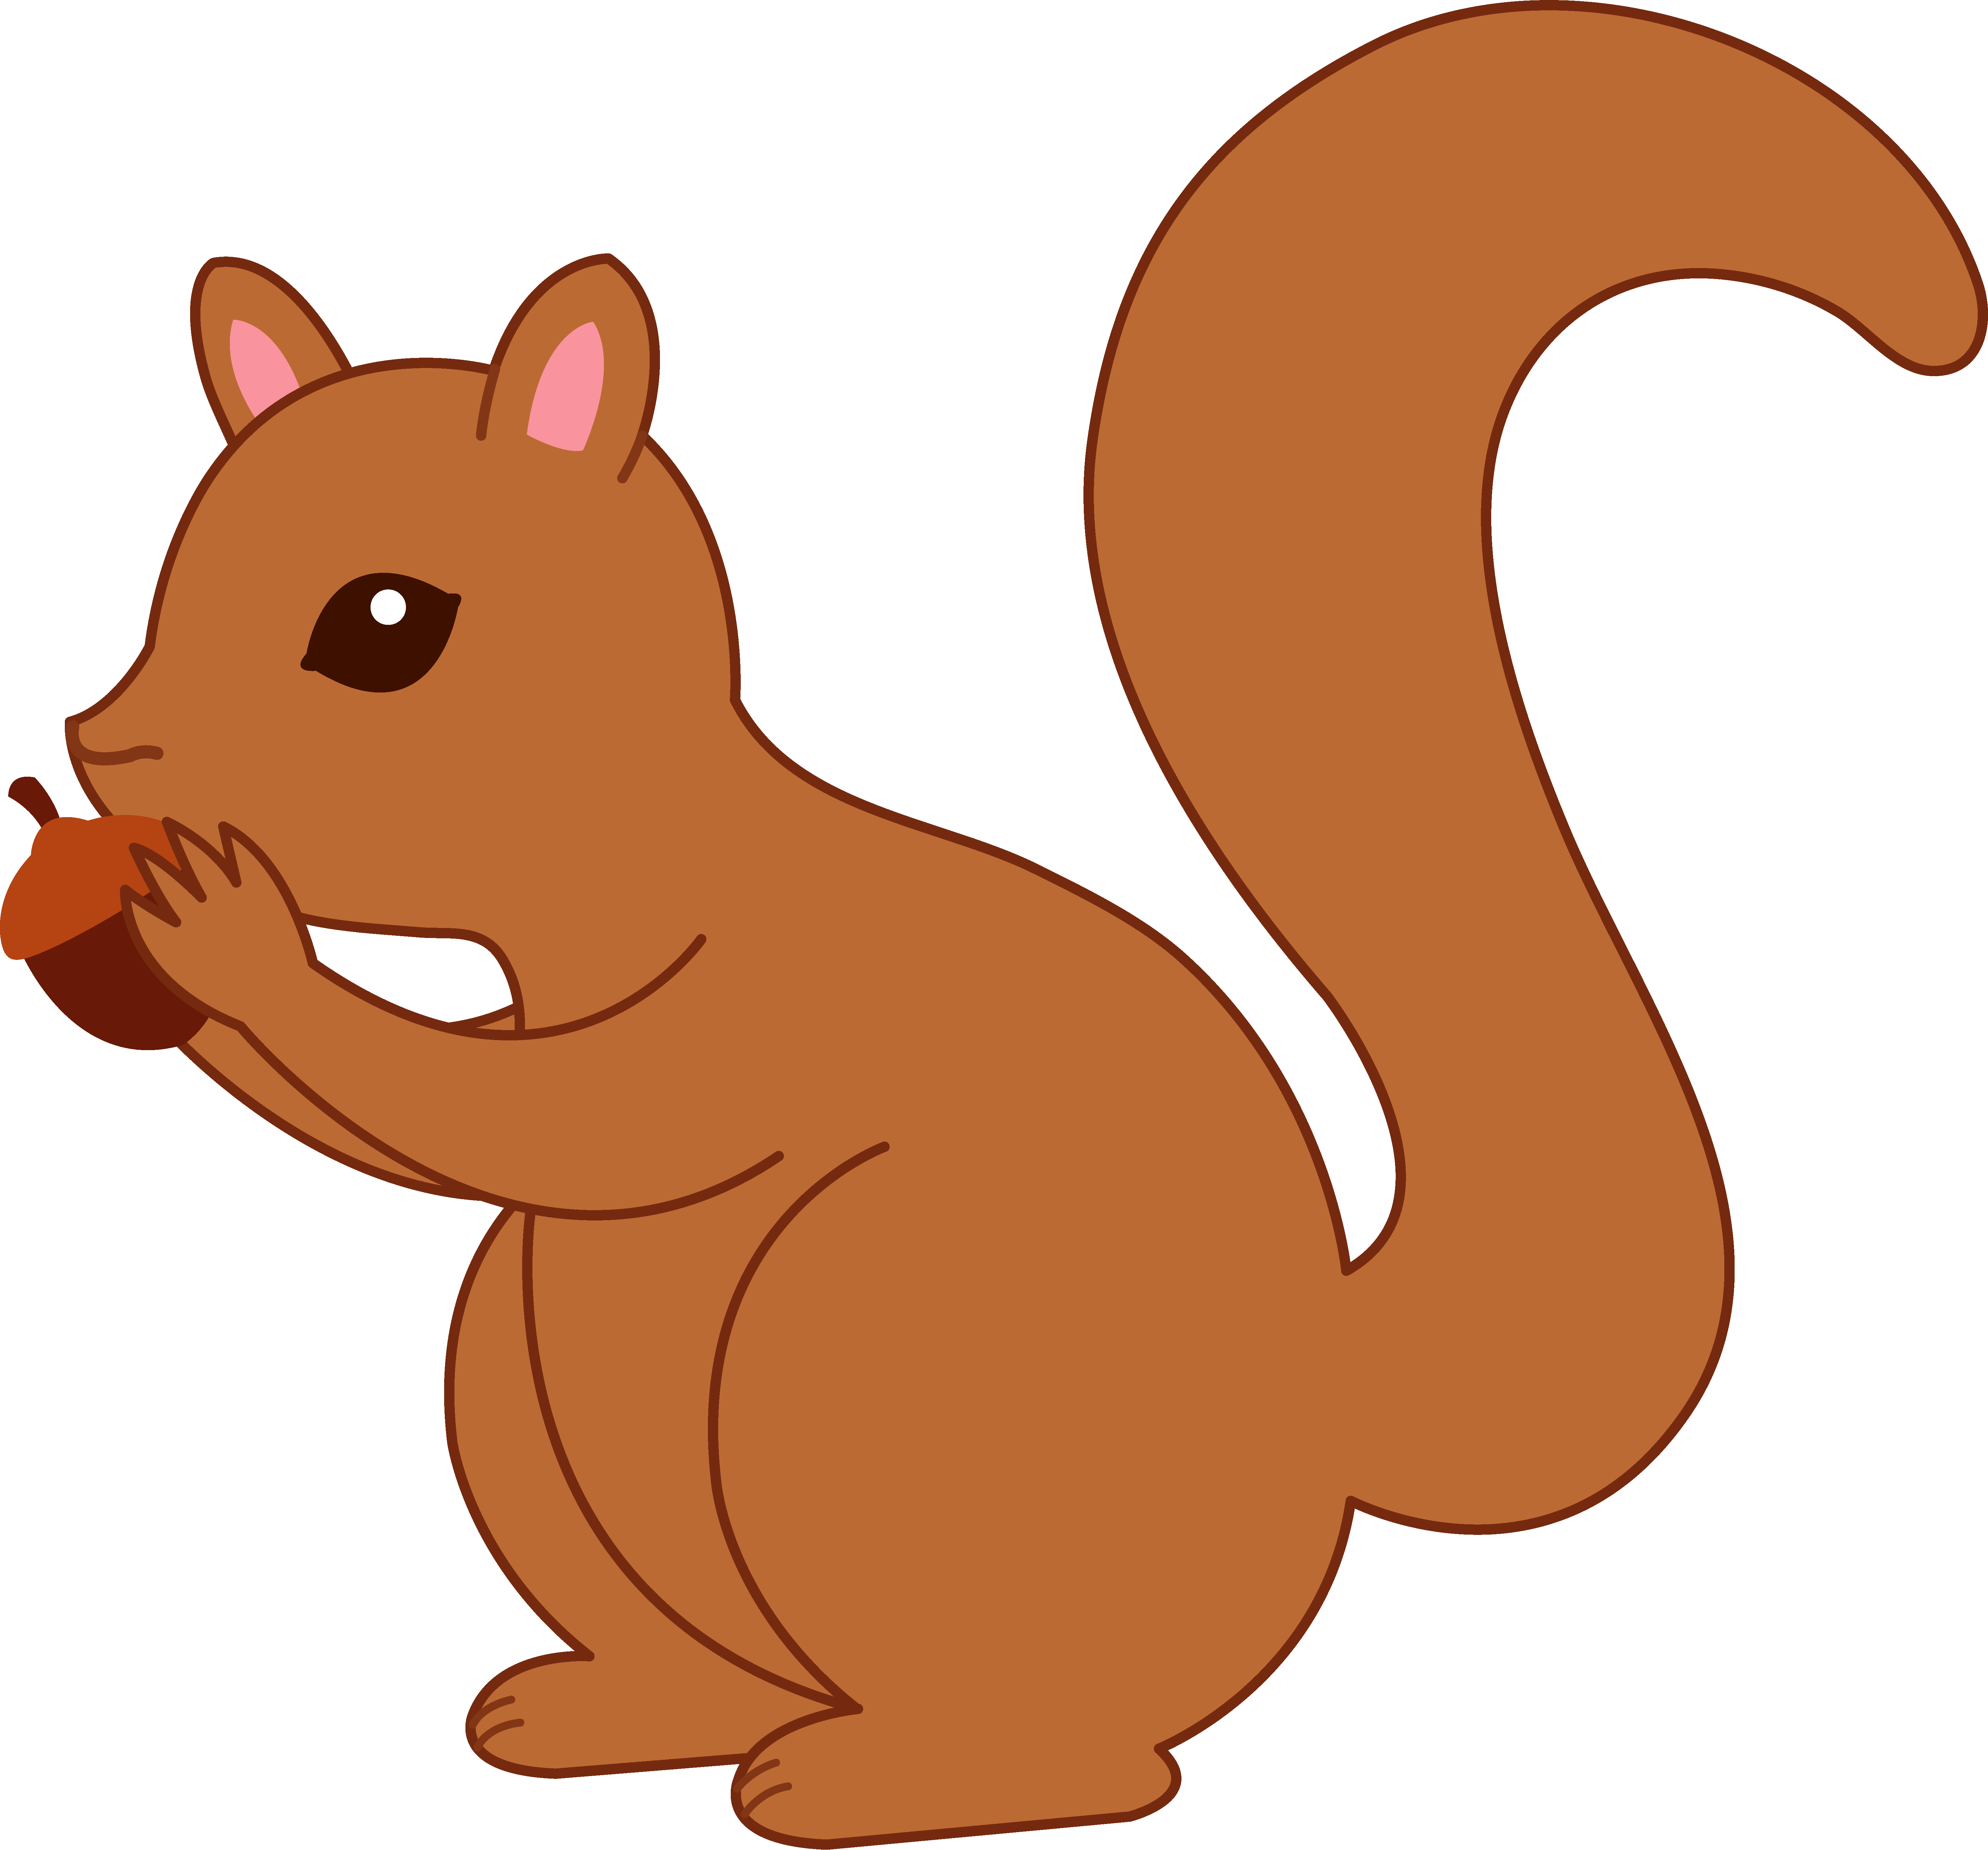 Chipmunk clipart cute Clipart Cute Clipart Bay Squirrel